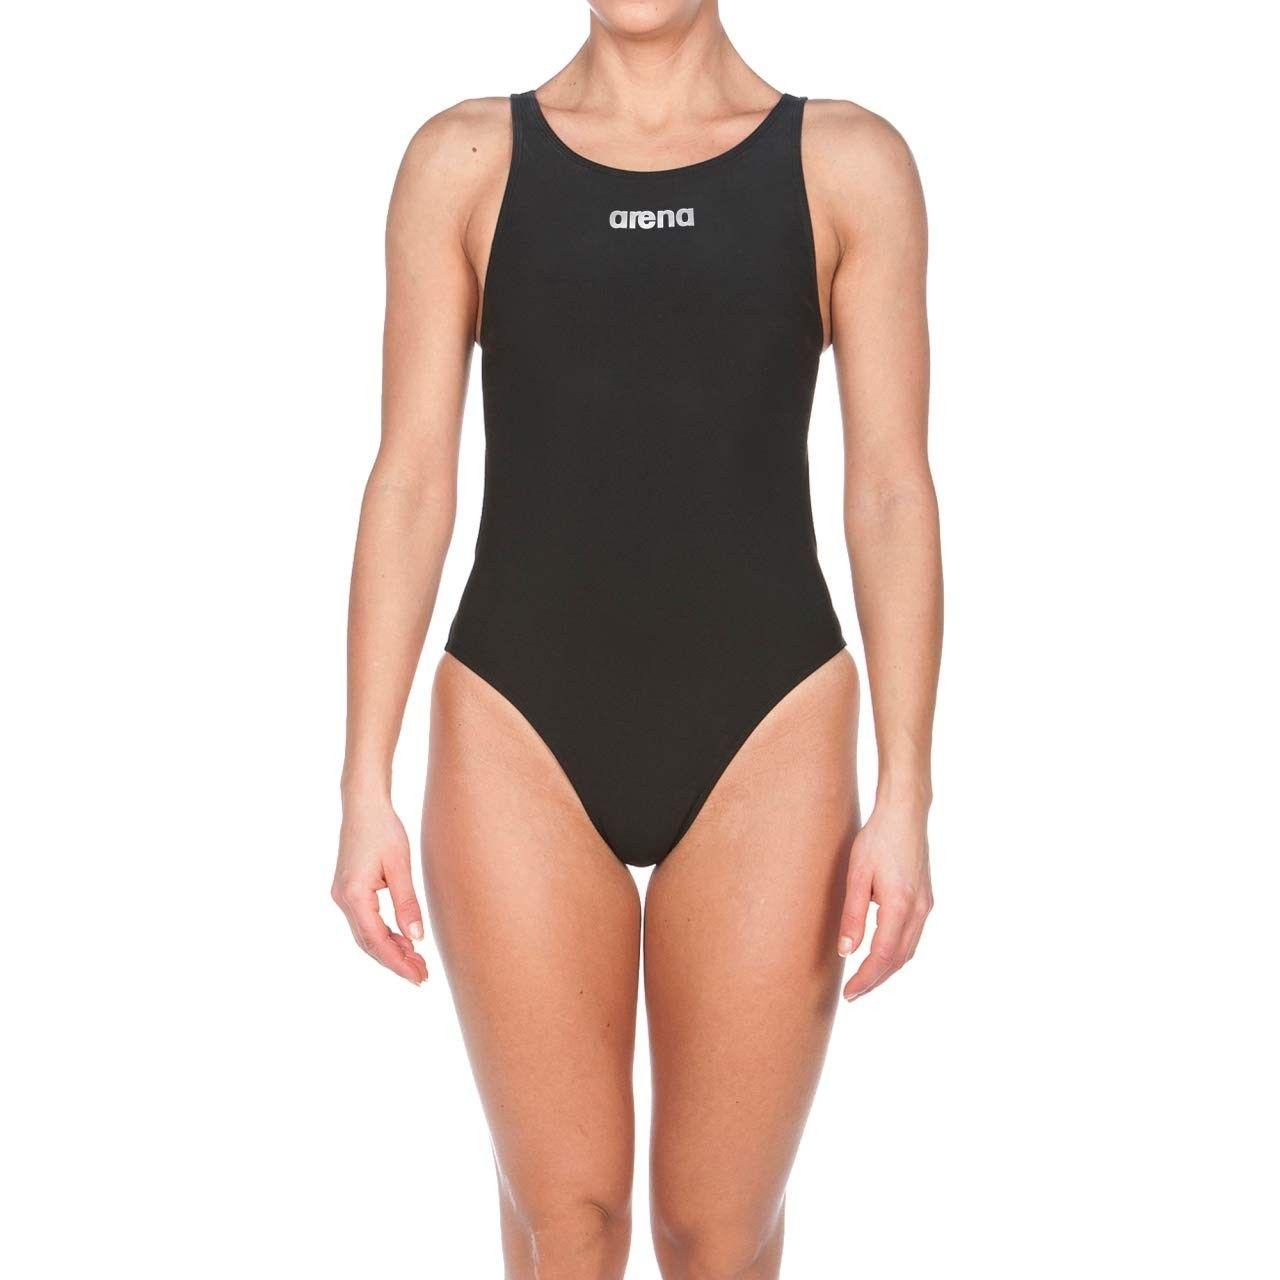 Powerskin ST Classic Suit - Black - Size 22 - CK11LT6ACFX - Sports & Fitness Clothing, Women, Swimwe...